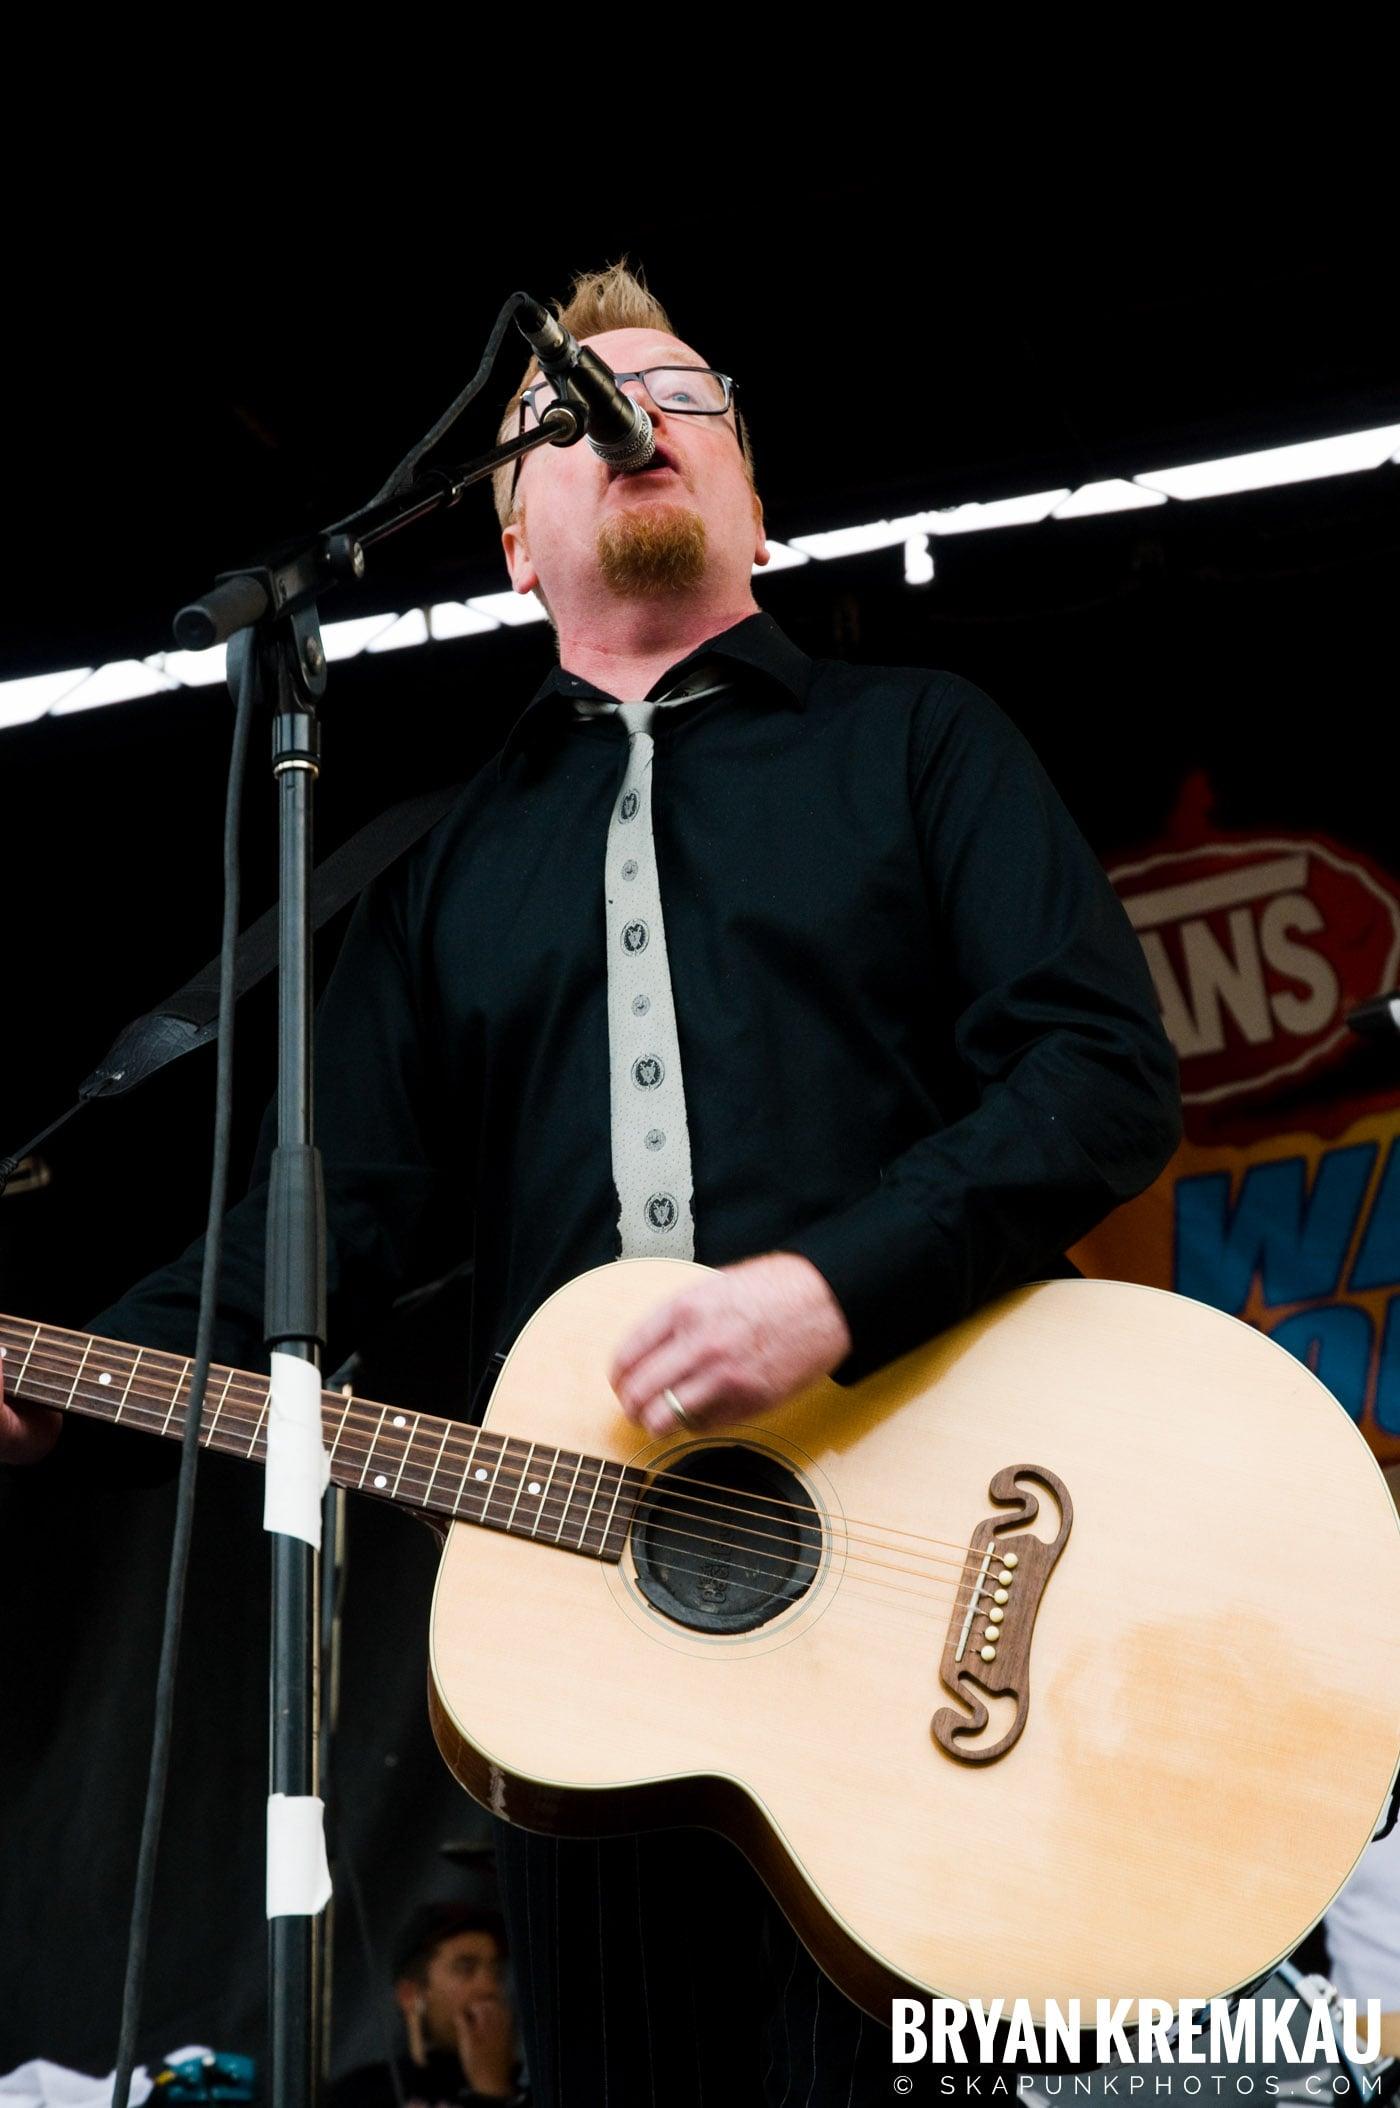 Flogging Molly @ Warped Tour 2009, Scranton PA - 07.15.09 (16)